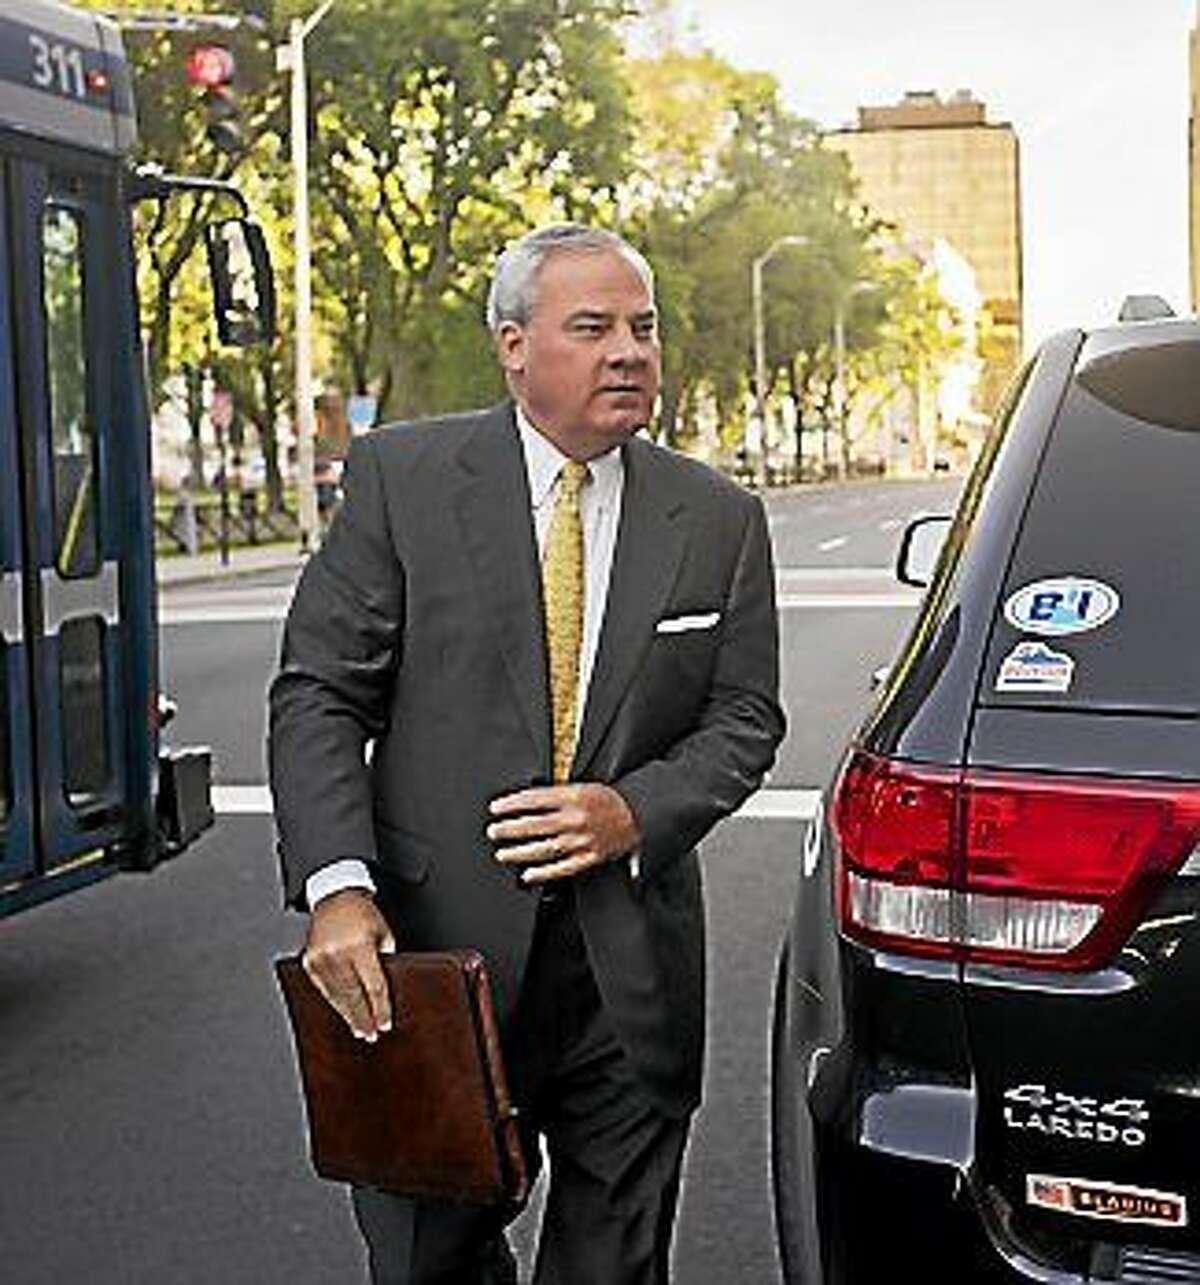 Former Connecticut Gov. John G. Rowland. (CT NewsJunkie)